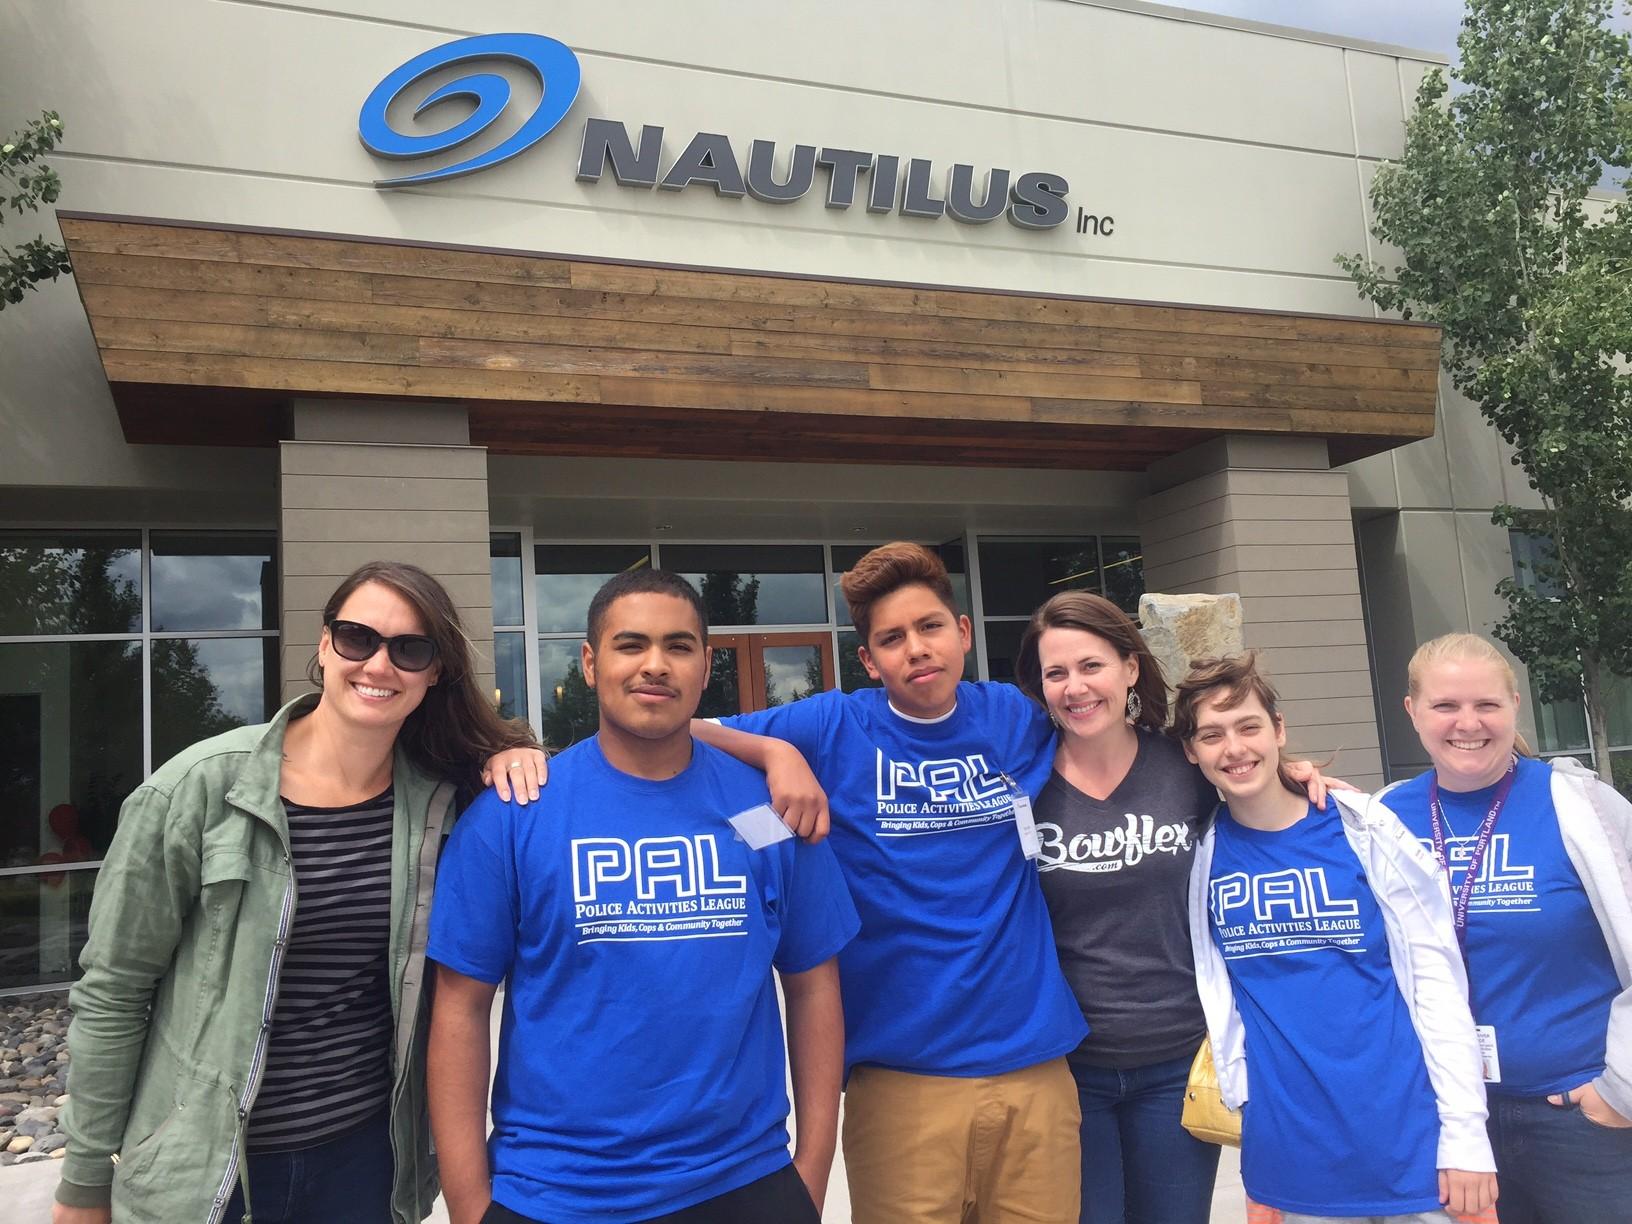 Police Activities League of SW Washington | LinkedIn